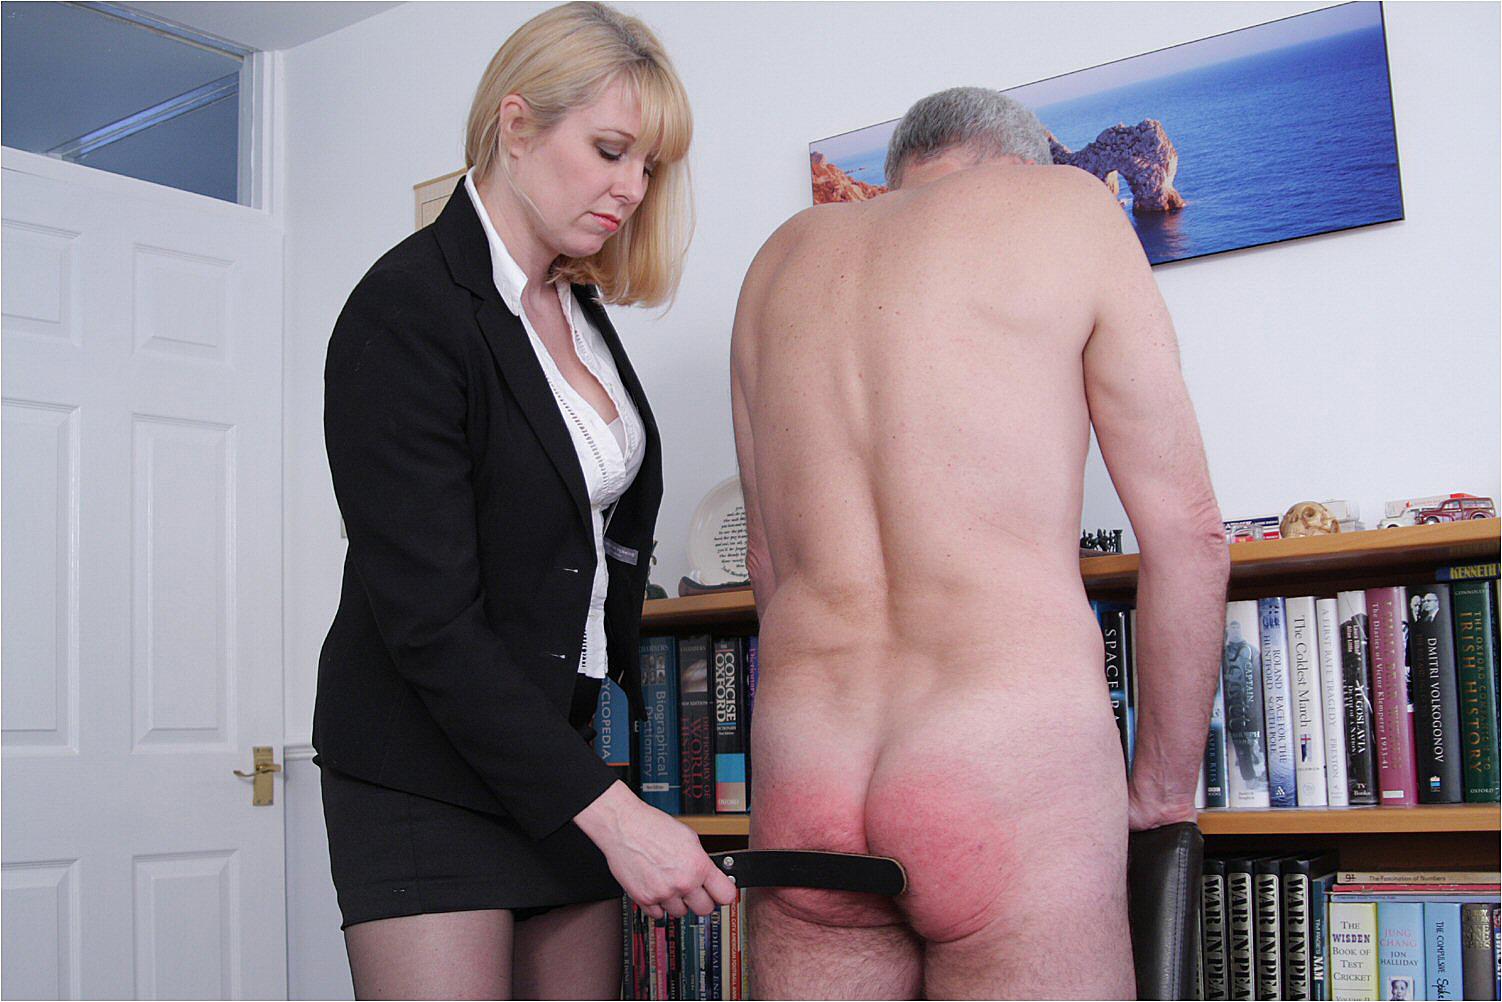 www.vixenladies.com - femdom - women spanking men